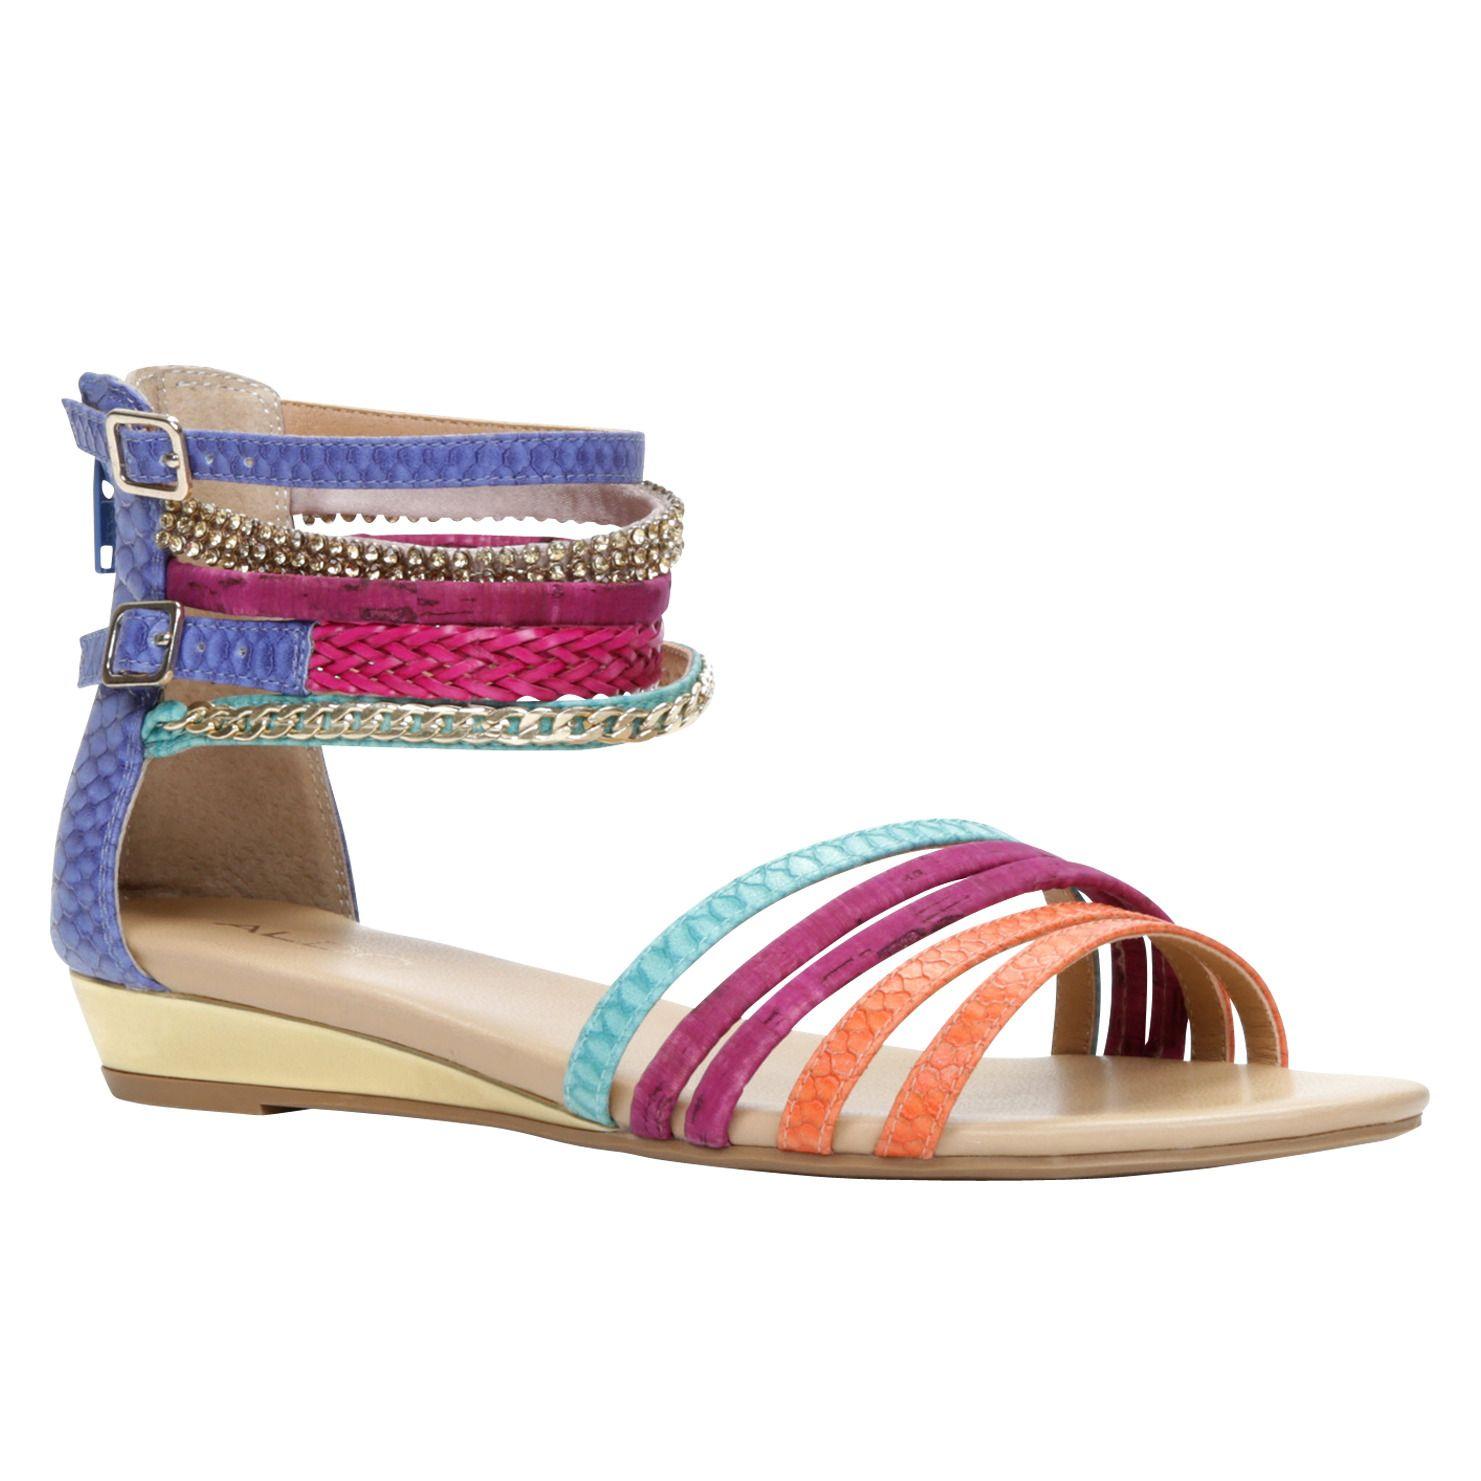 Sandals shoes sale - Leady Women S Low Mid Heels Sandals For Sale At Aldo Shoes I Bought